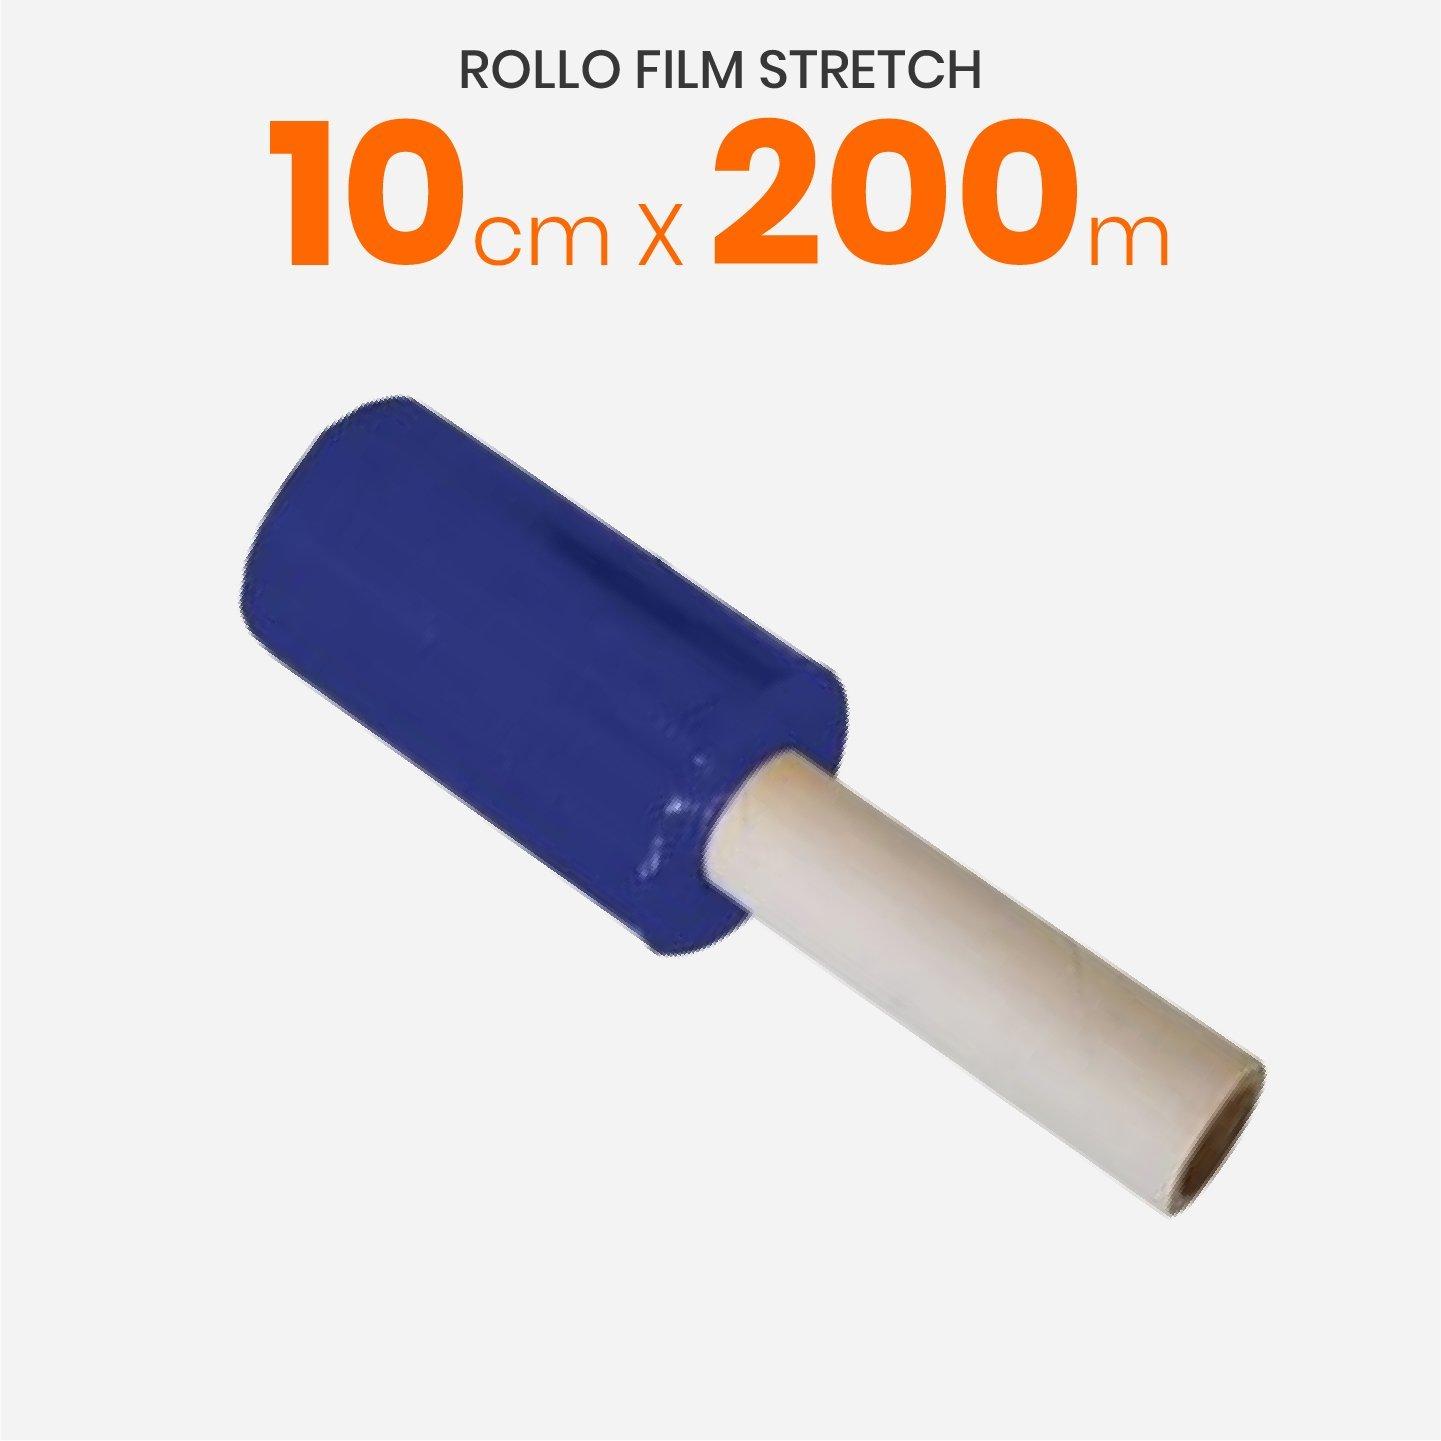 Rollo Film Stretch Virgen Azul Reforzado Con Mango 10cm x 200mts